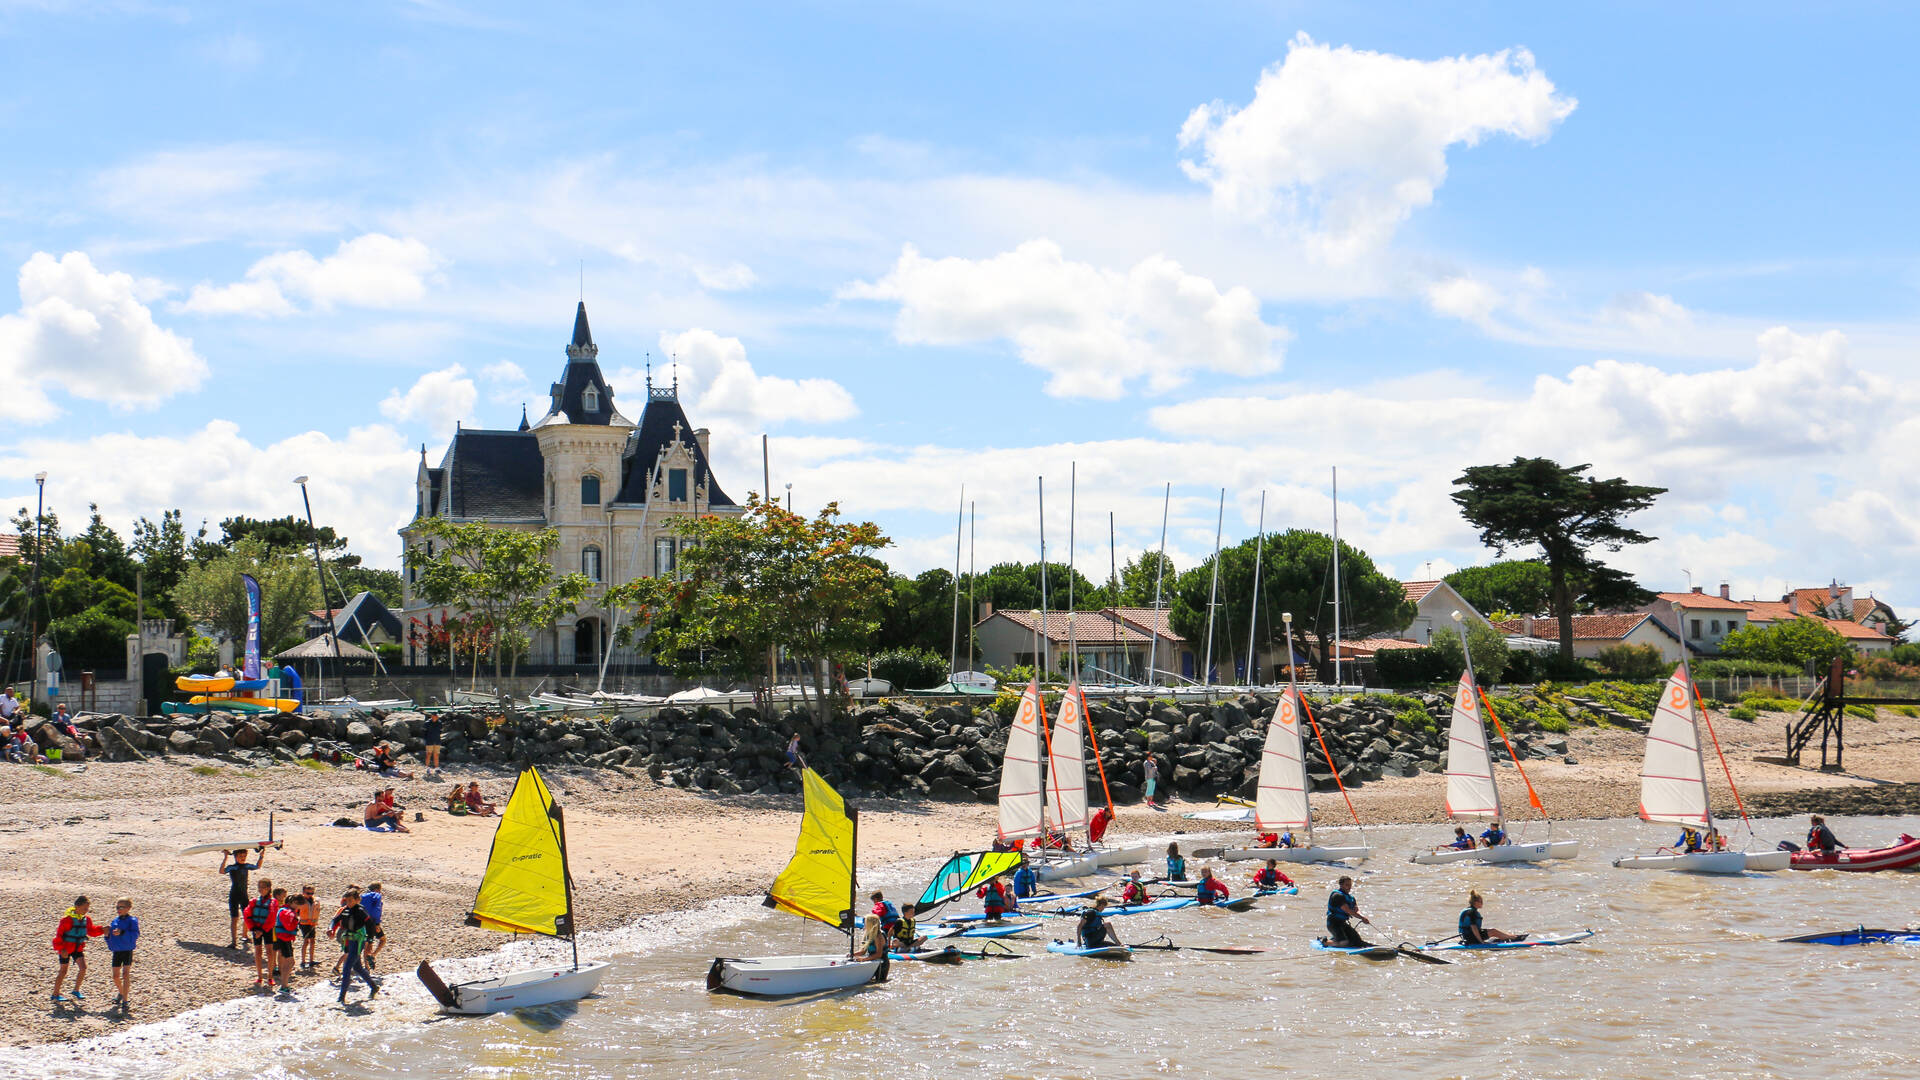 Nautisme, station balnéaire de Fouras-les-Bains, Rochefort Océan, Charente-Maritime